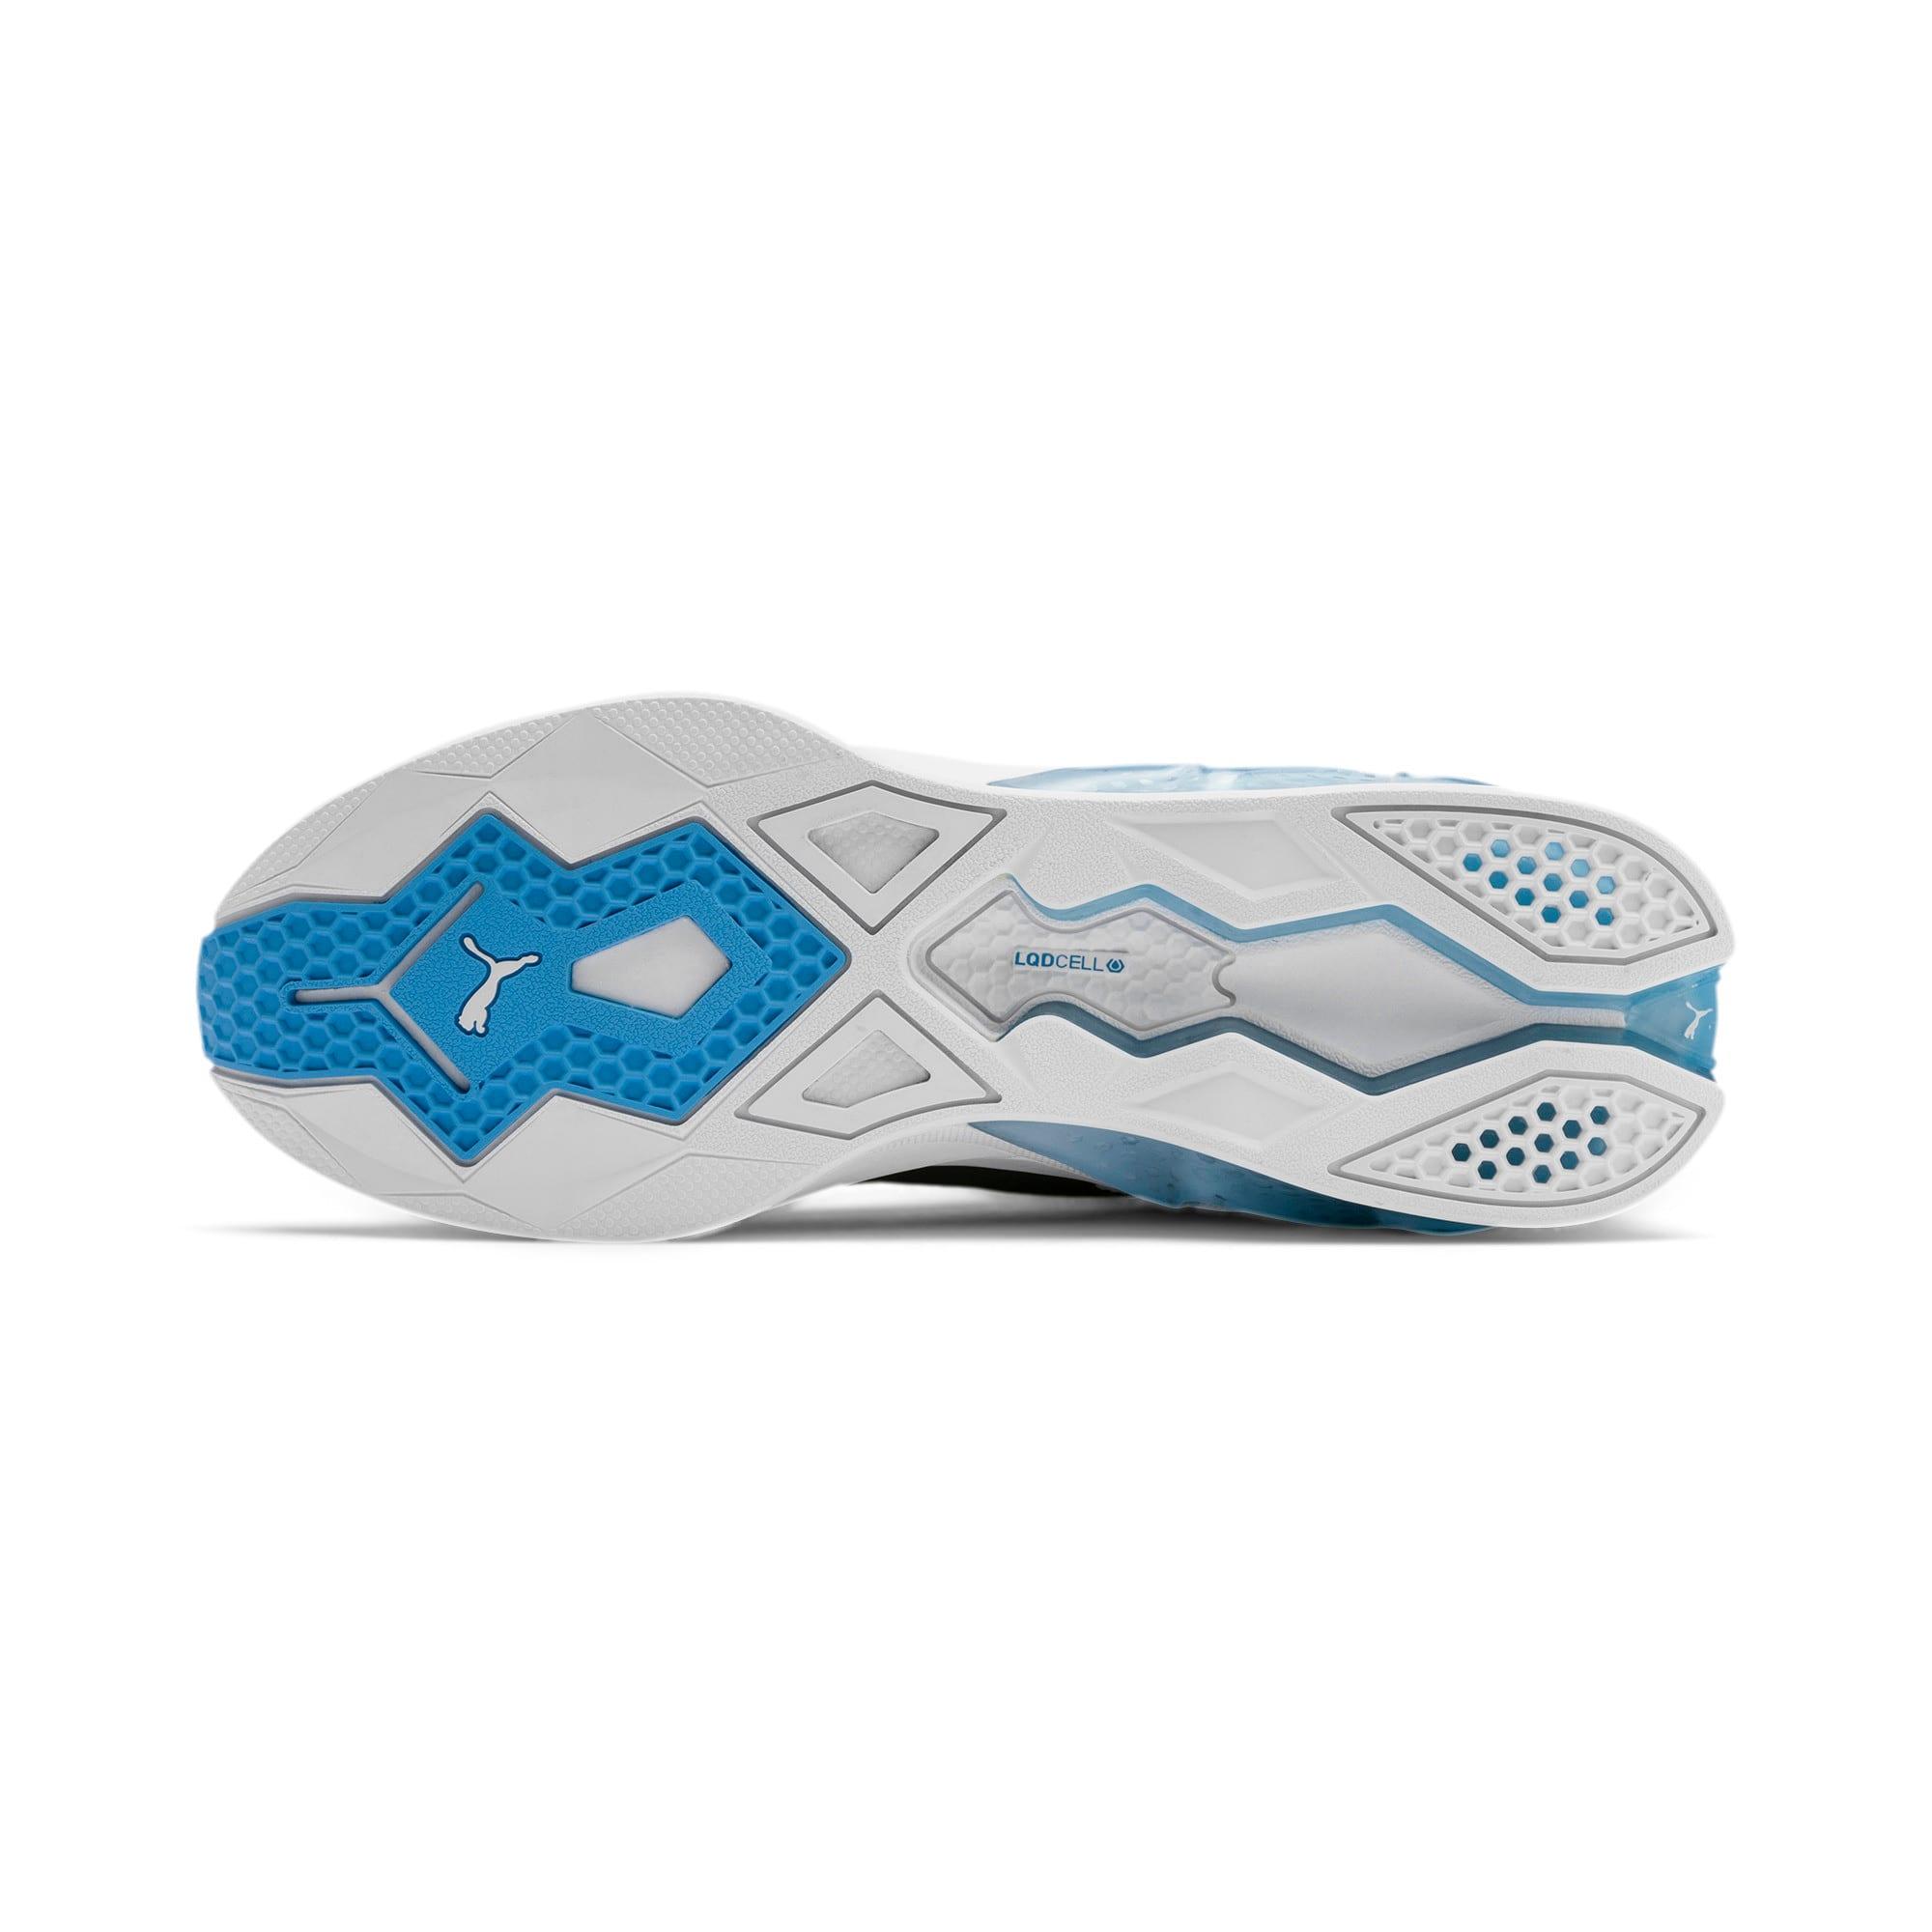 Thumbnail 5 of LQDCELL Origin Herren Sneaker, Puma White-Puma Black, medium